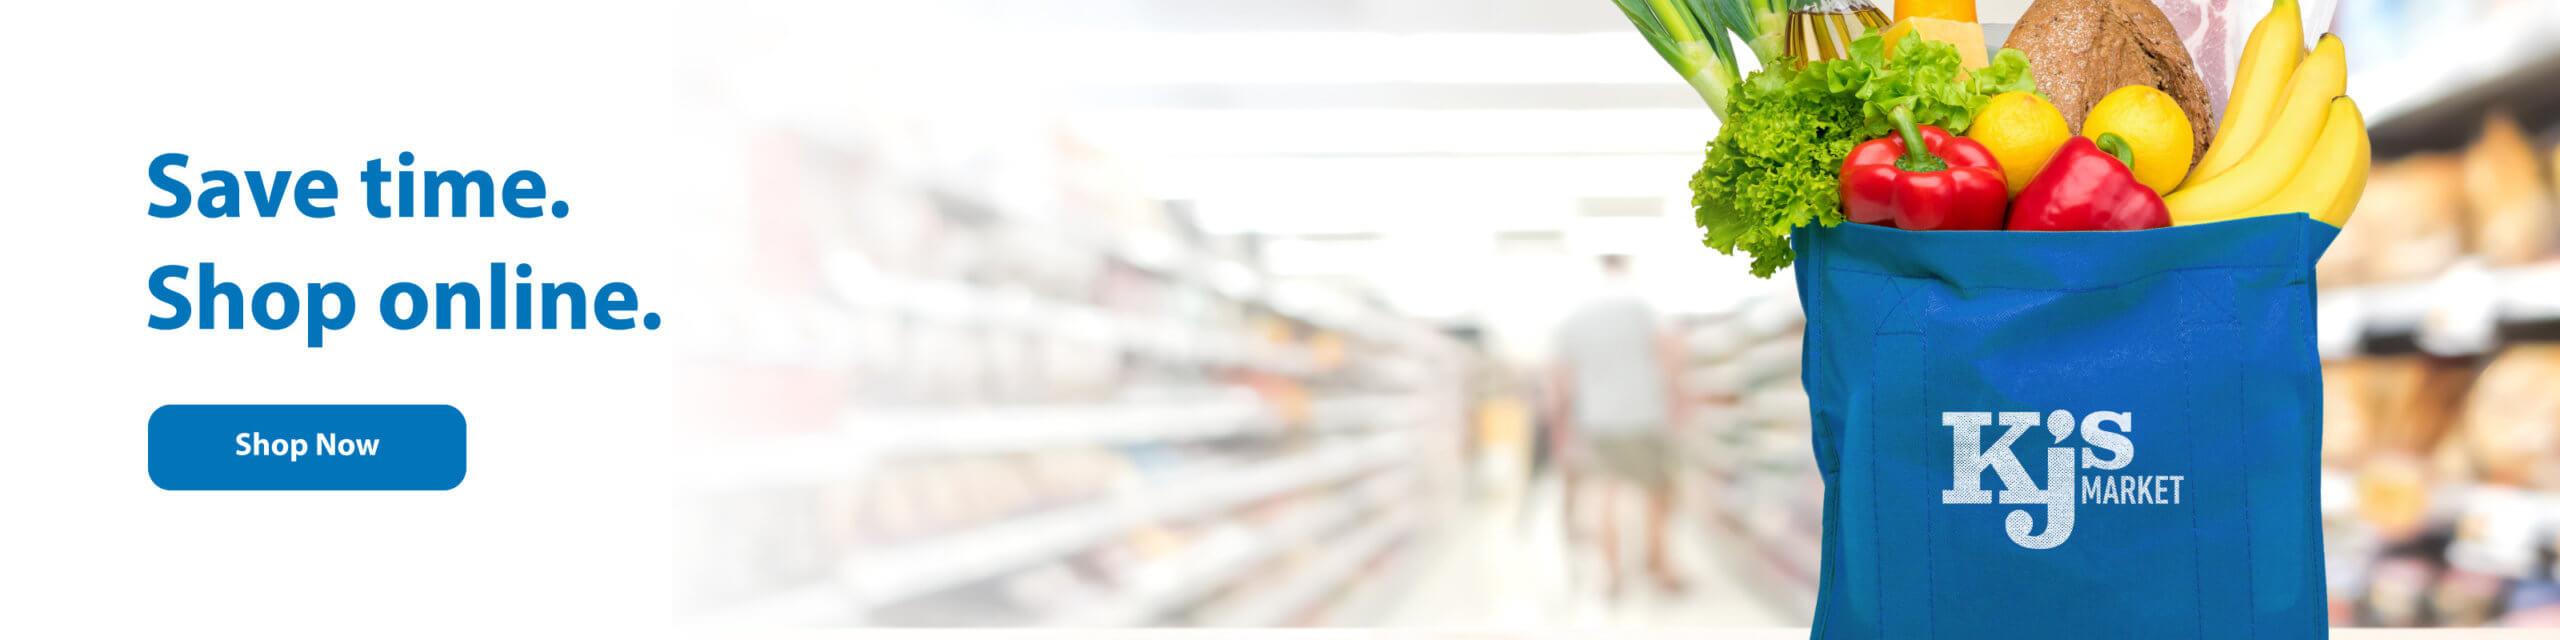 WLF_Online_Shopping-03